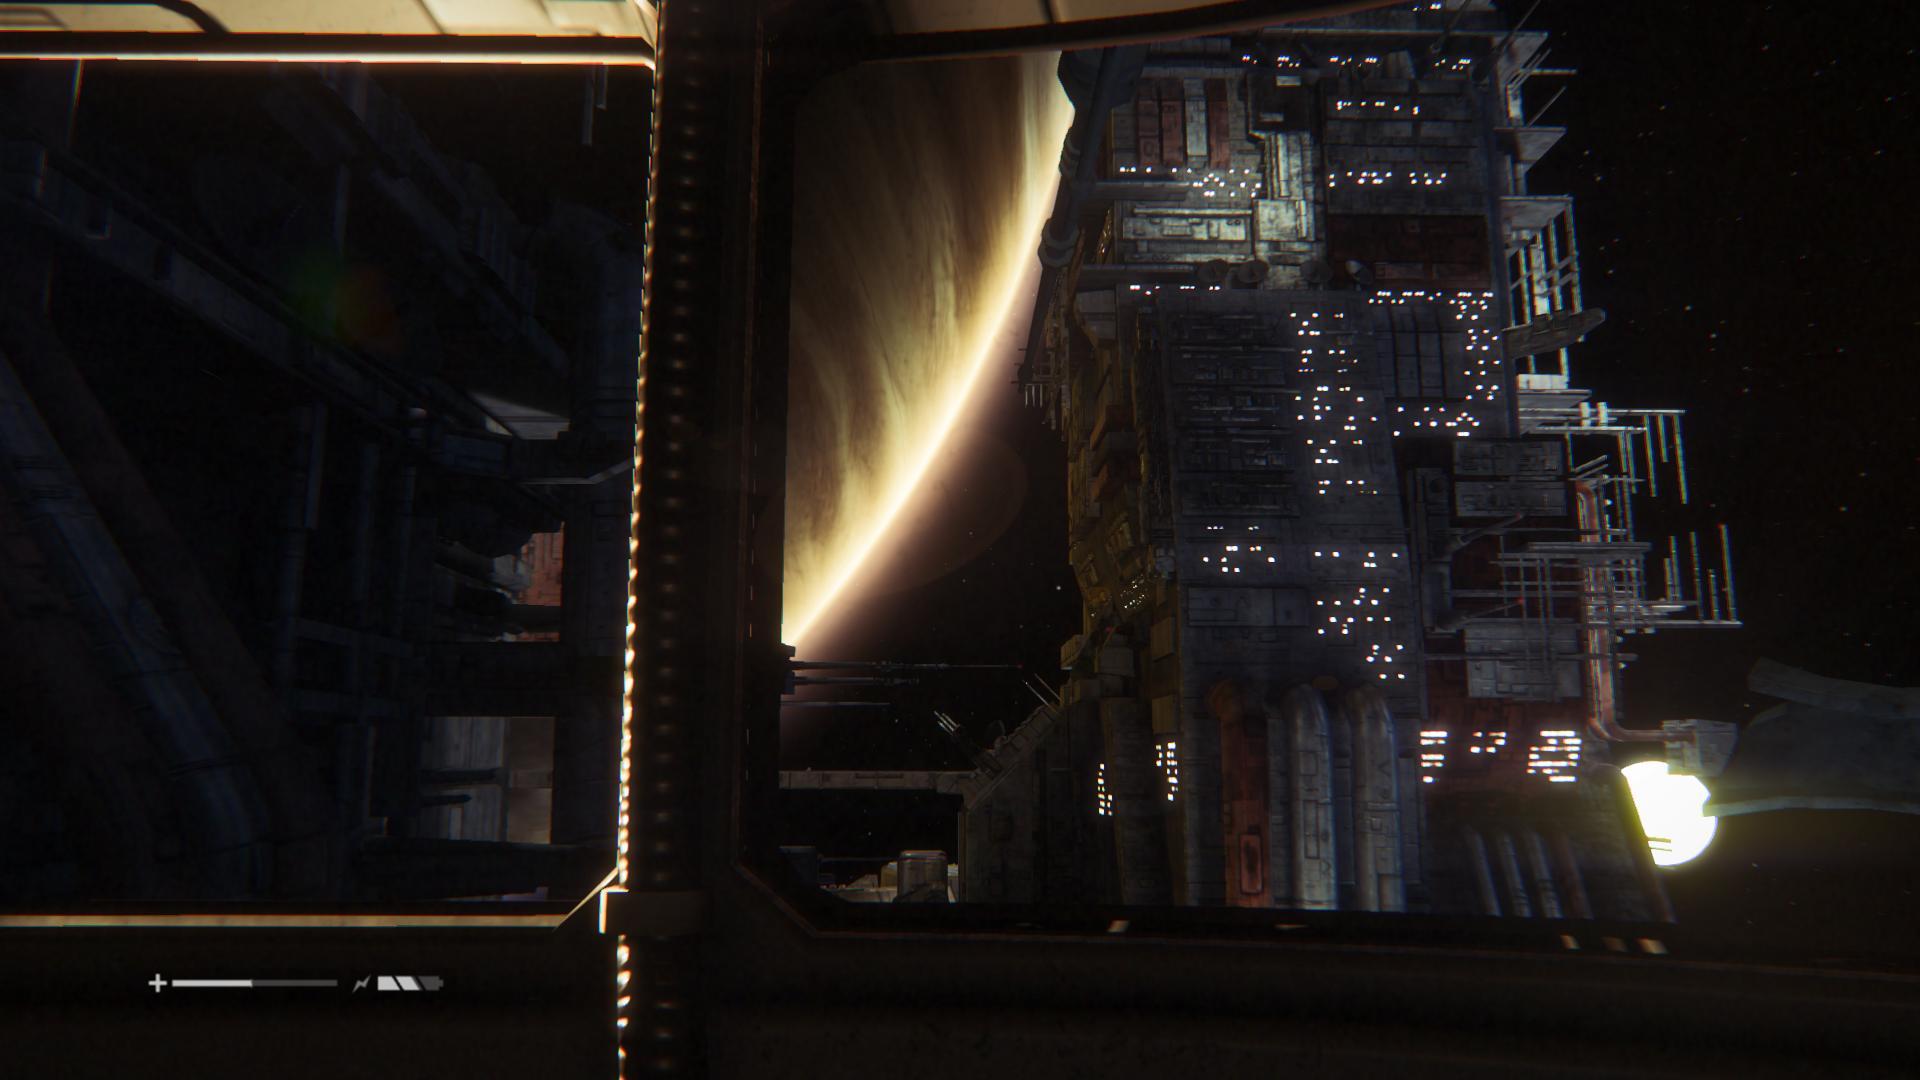 Recenze Alien: Isolation - Patnáct hodin v izolaci 9612